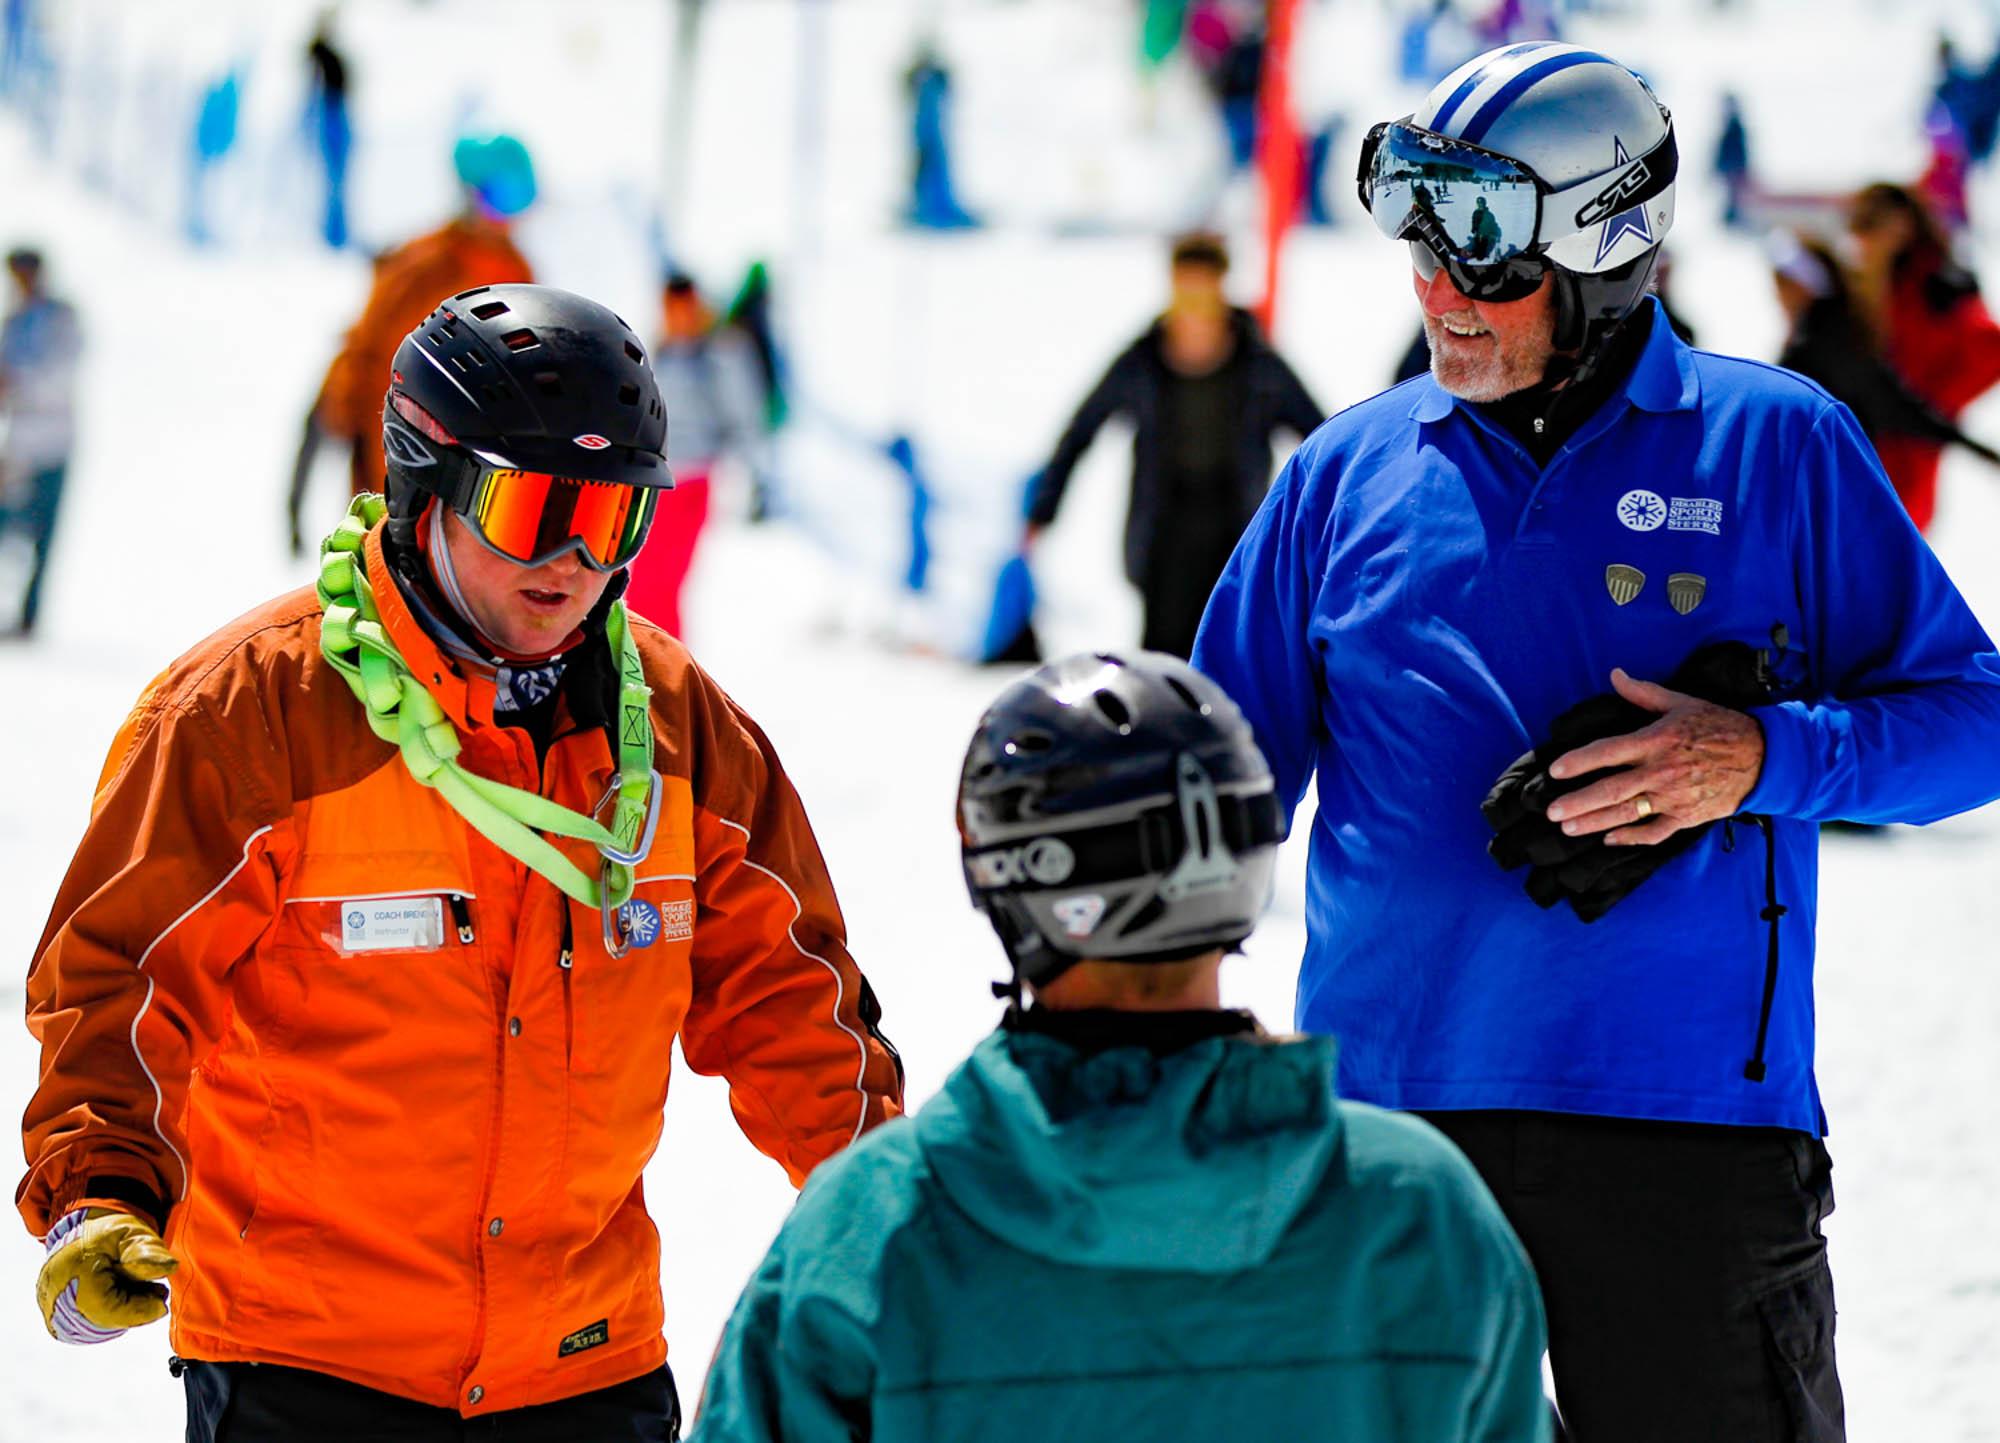 Skiing in a winter wonderland